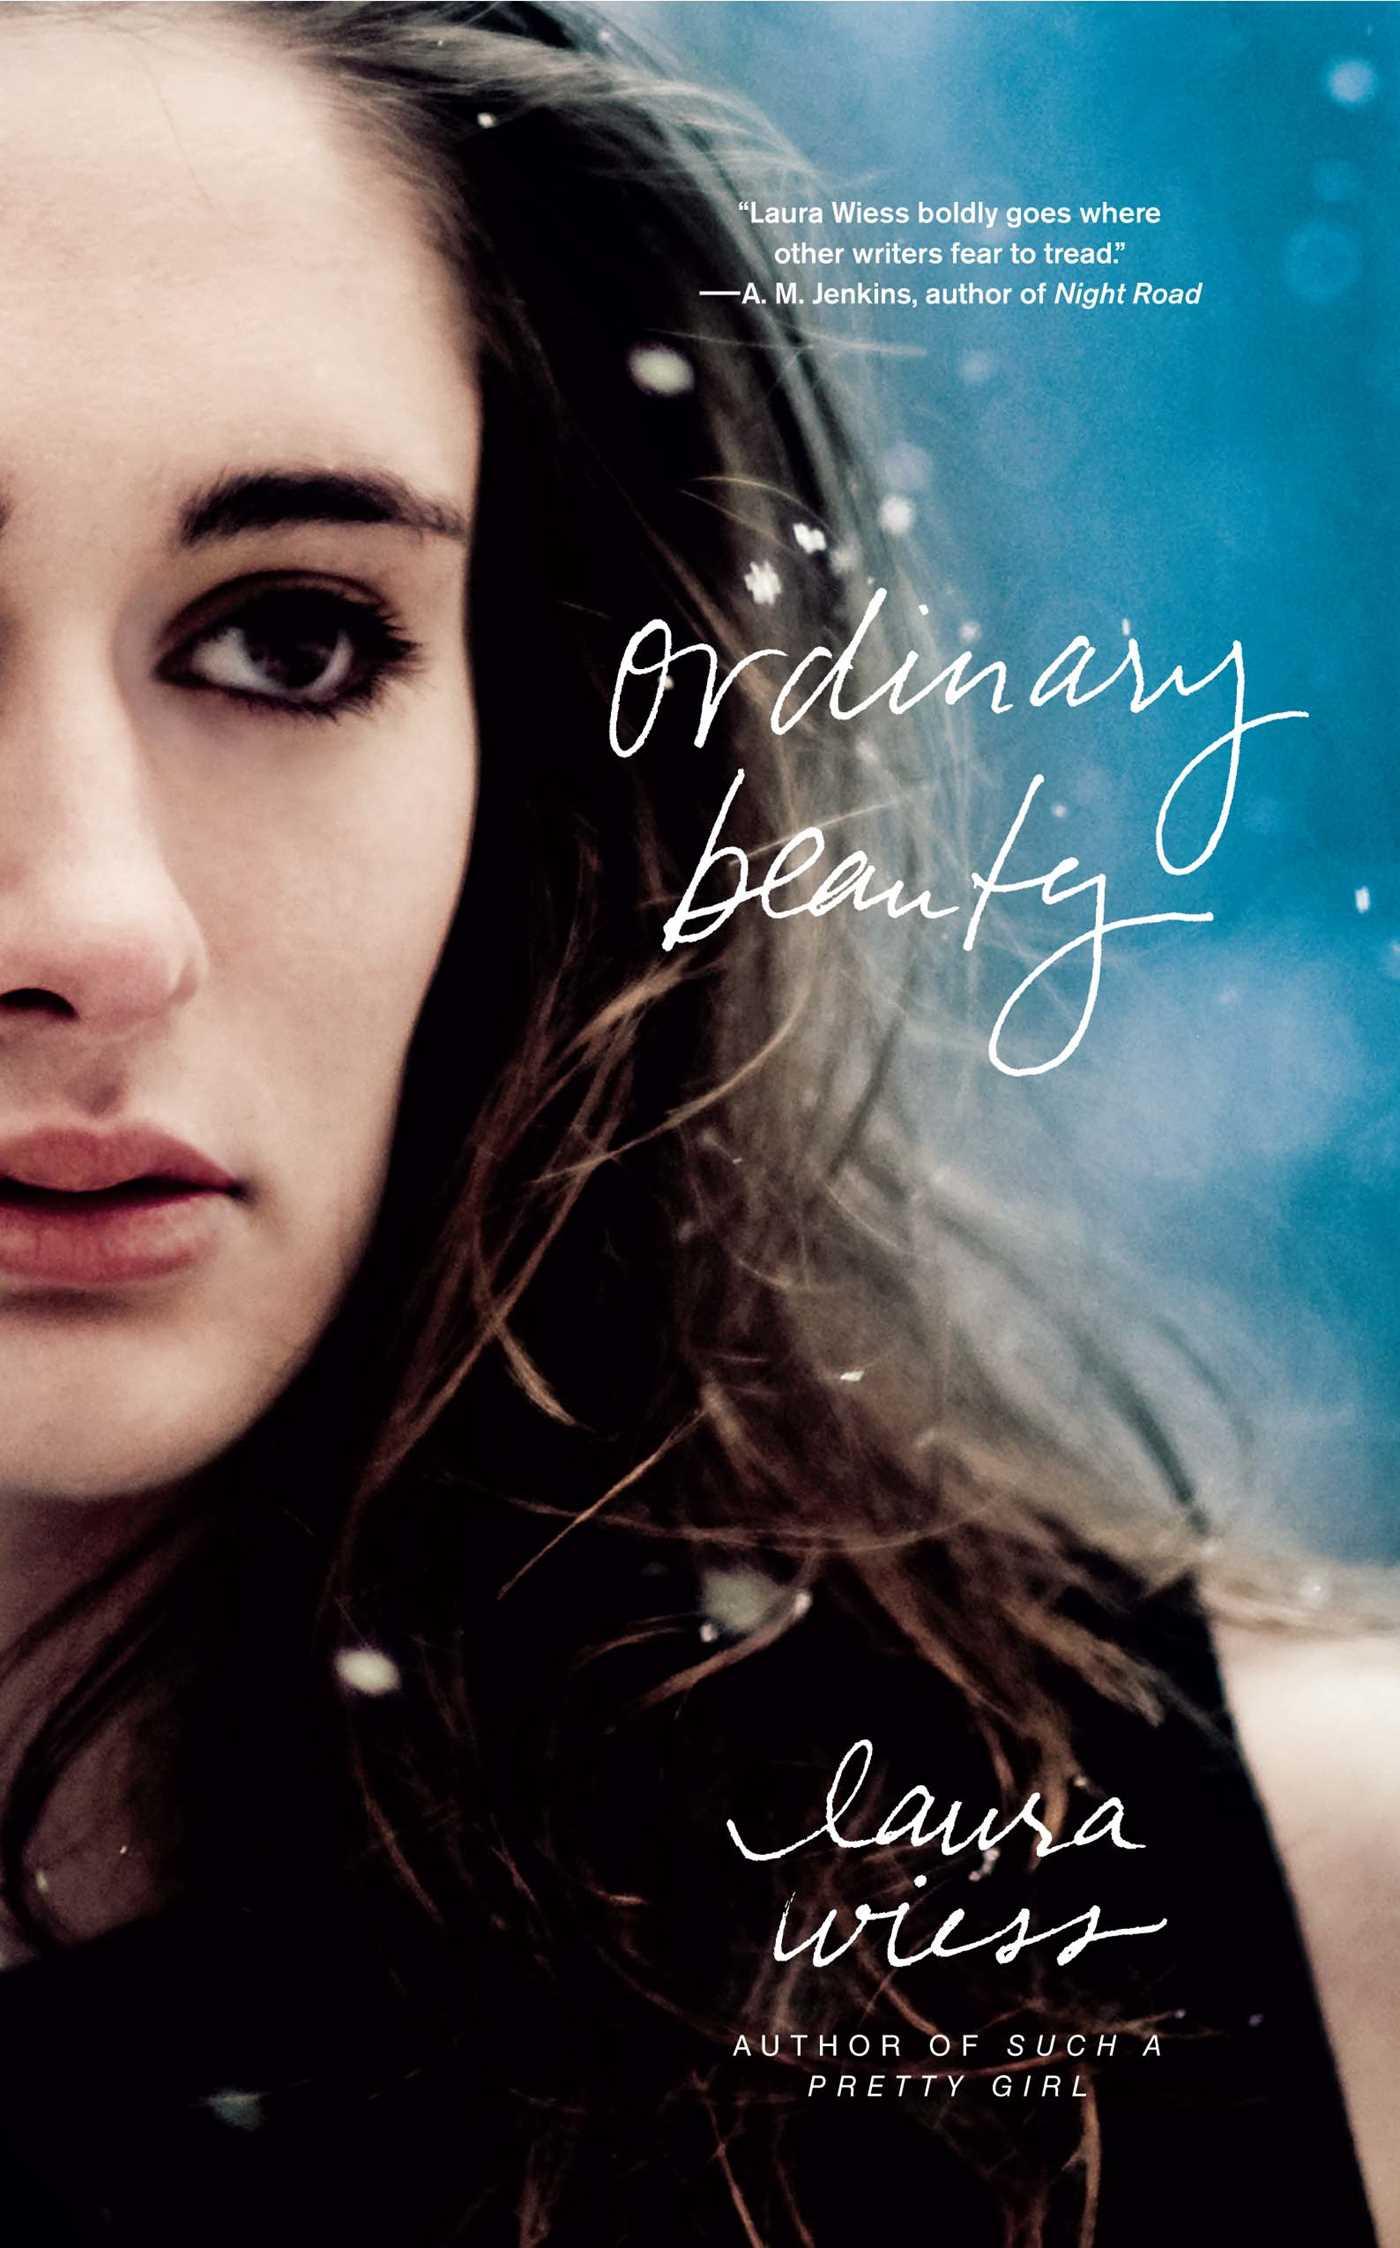 Ordinary beauty 9781439193969 hr